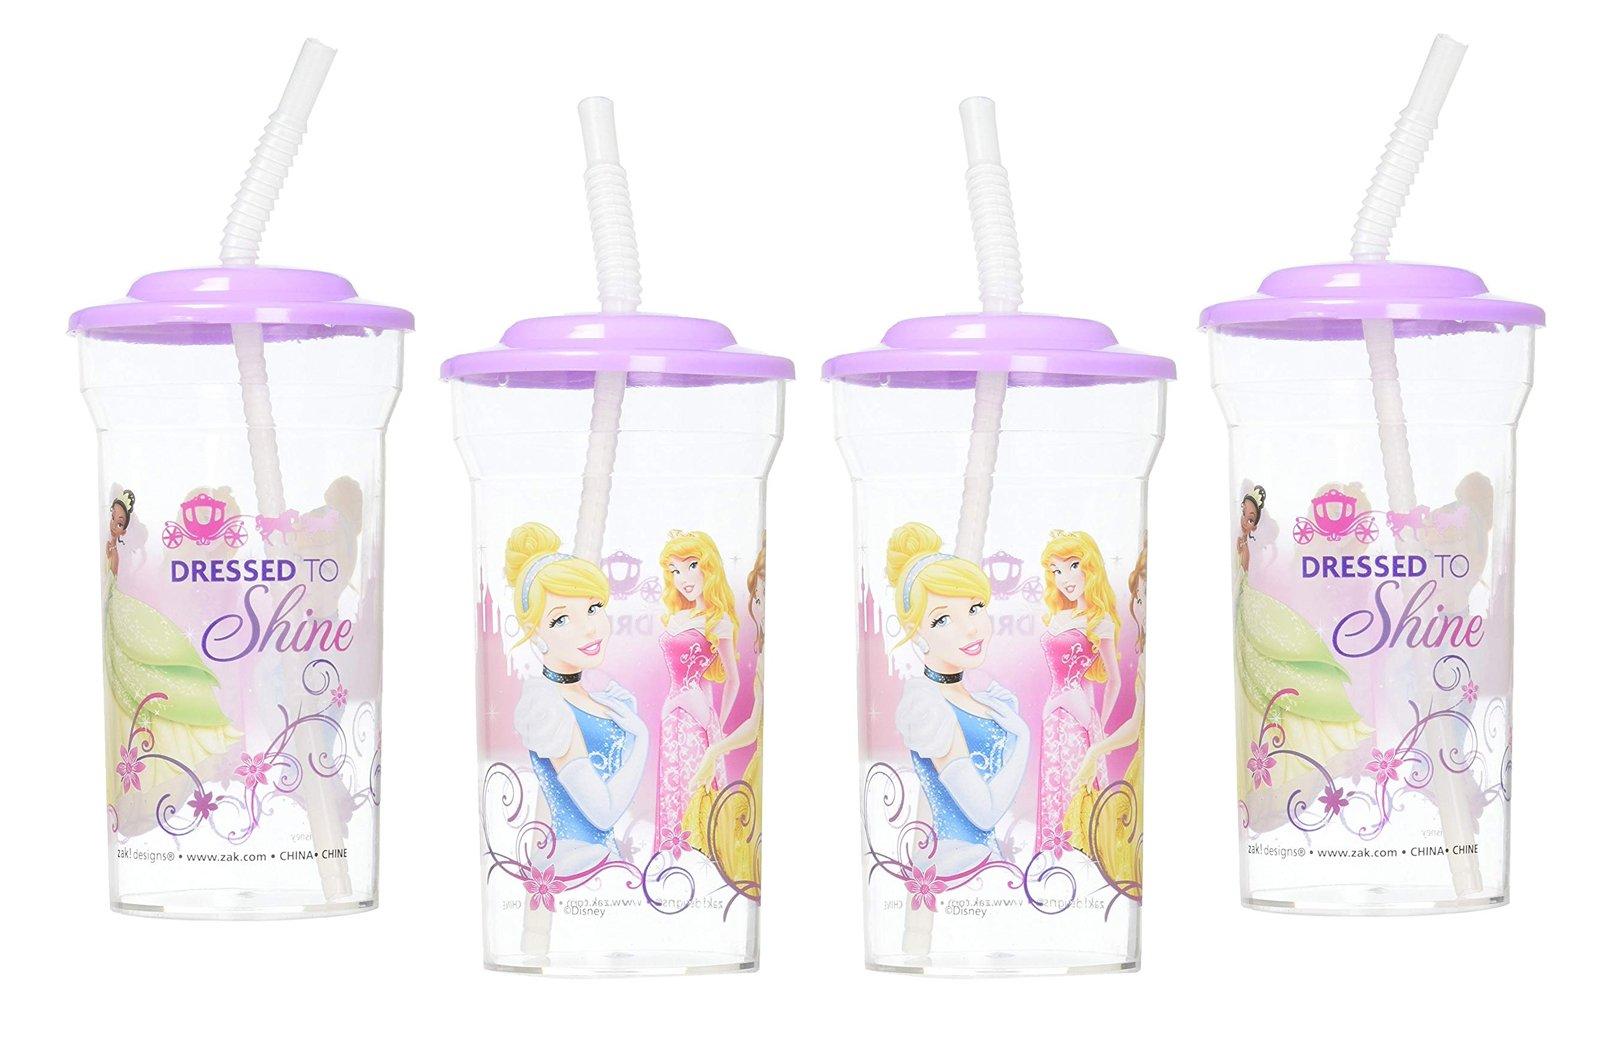 Zak Designs 4-Pack Disney Princess 16oz Sports Tumbler Cups with Pink Lids & Flex Straws